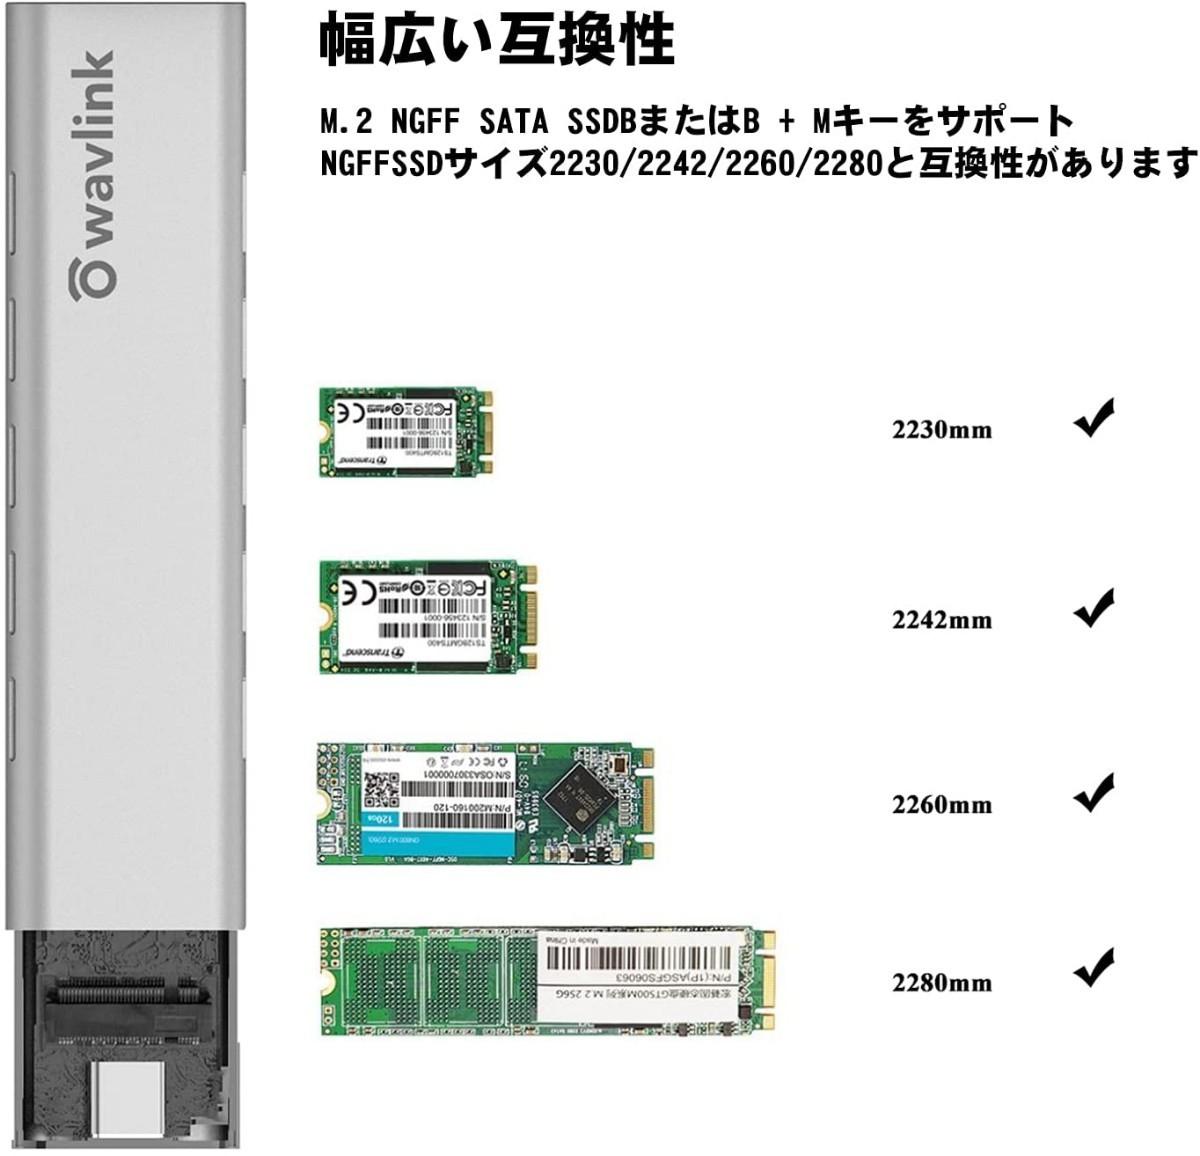 SSD ケース USB 3.1 Gen2 10Gbps SATA 高速転送